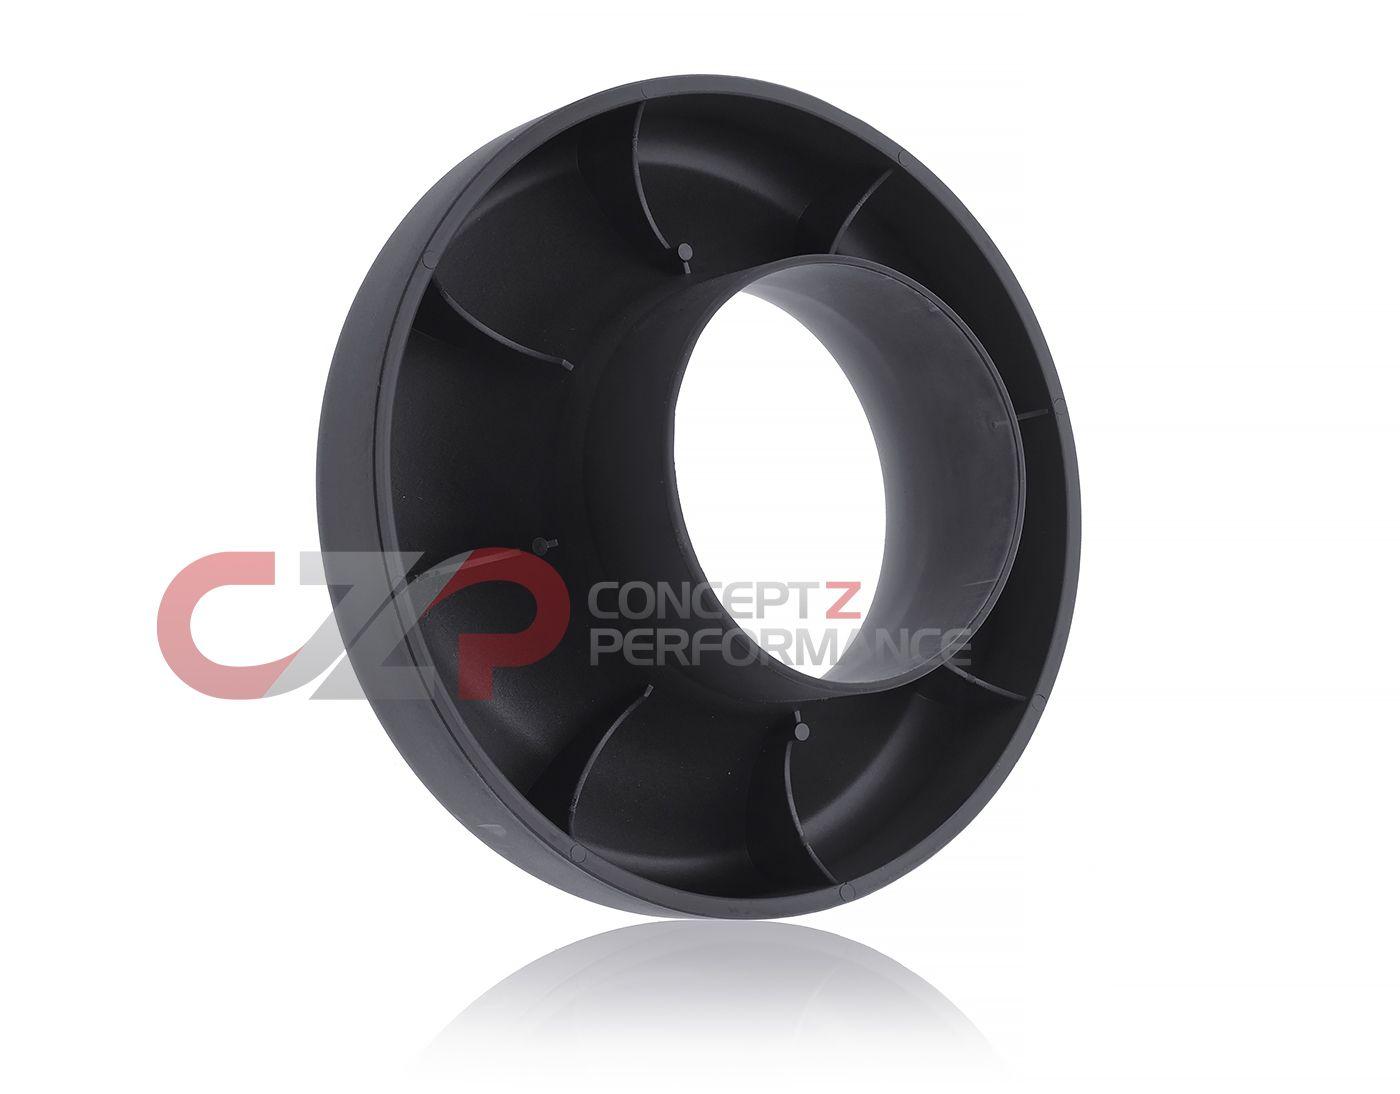 BLOX Racing 3.0inch Composite Velocity Stack BXIM-00300